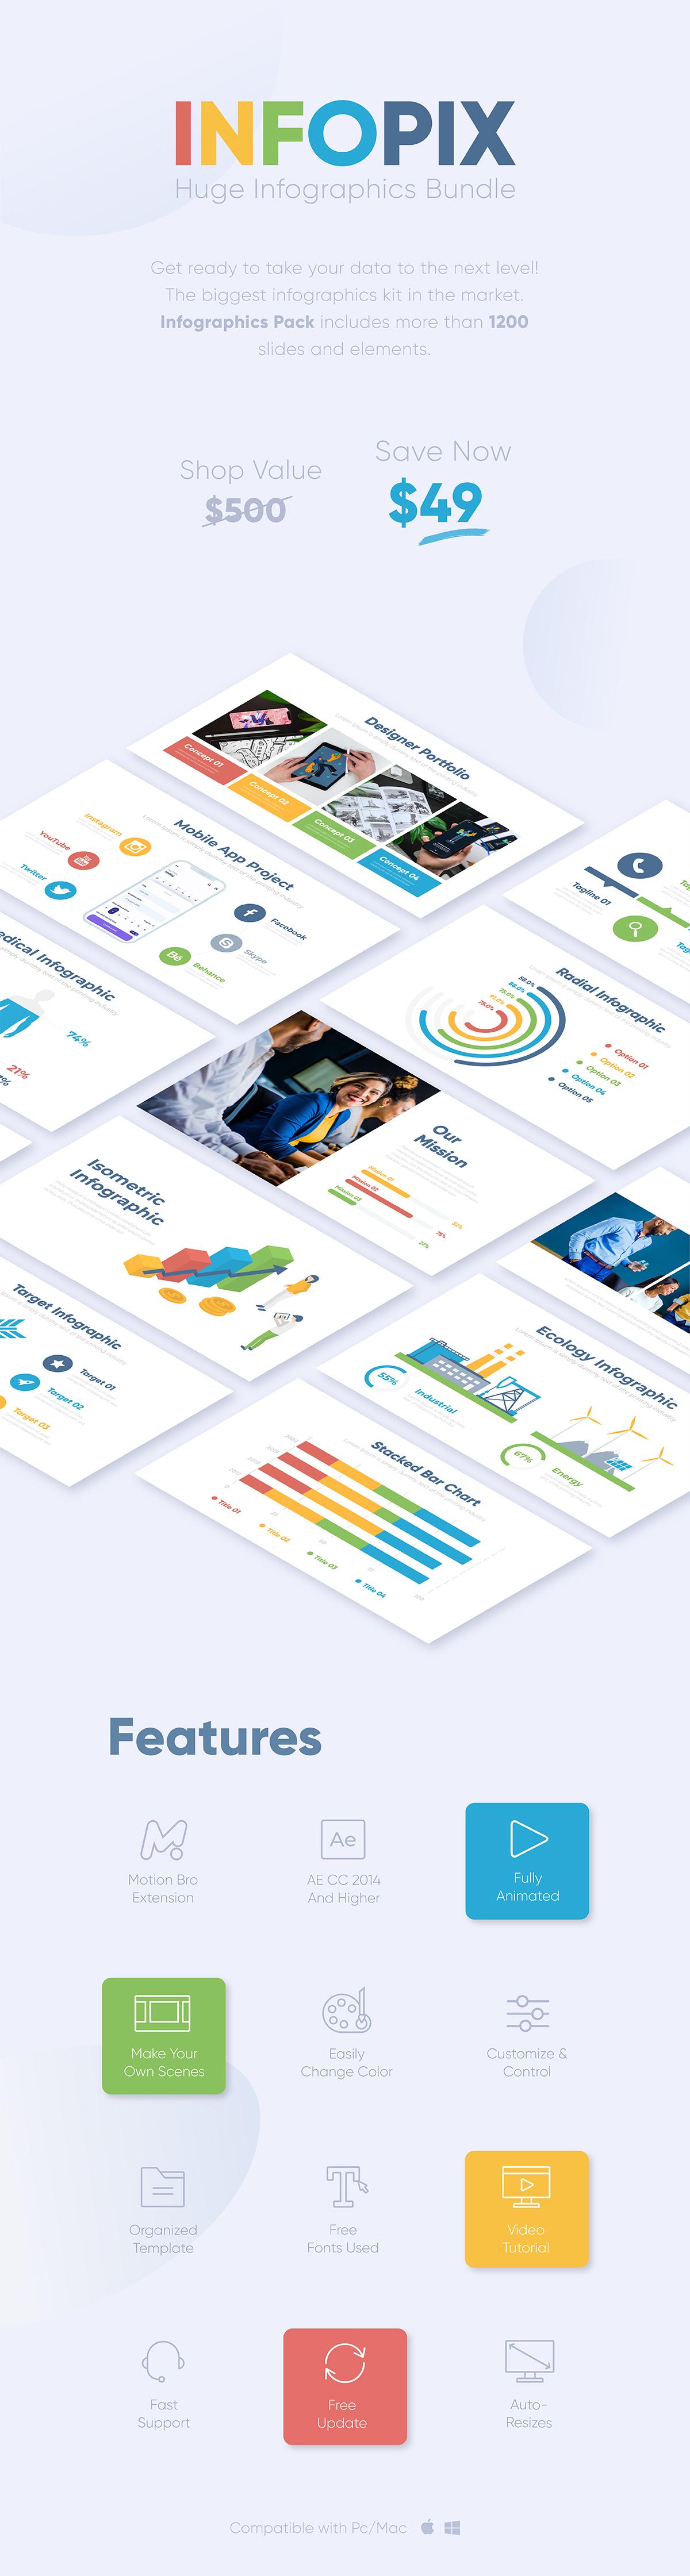 Infopix - Infographics Pack - 2